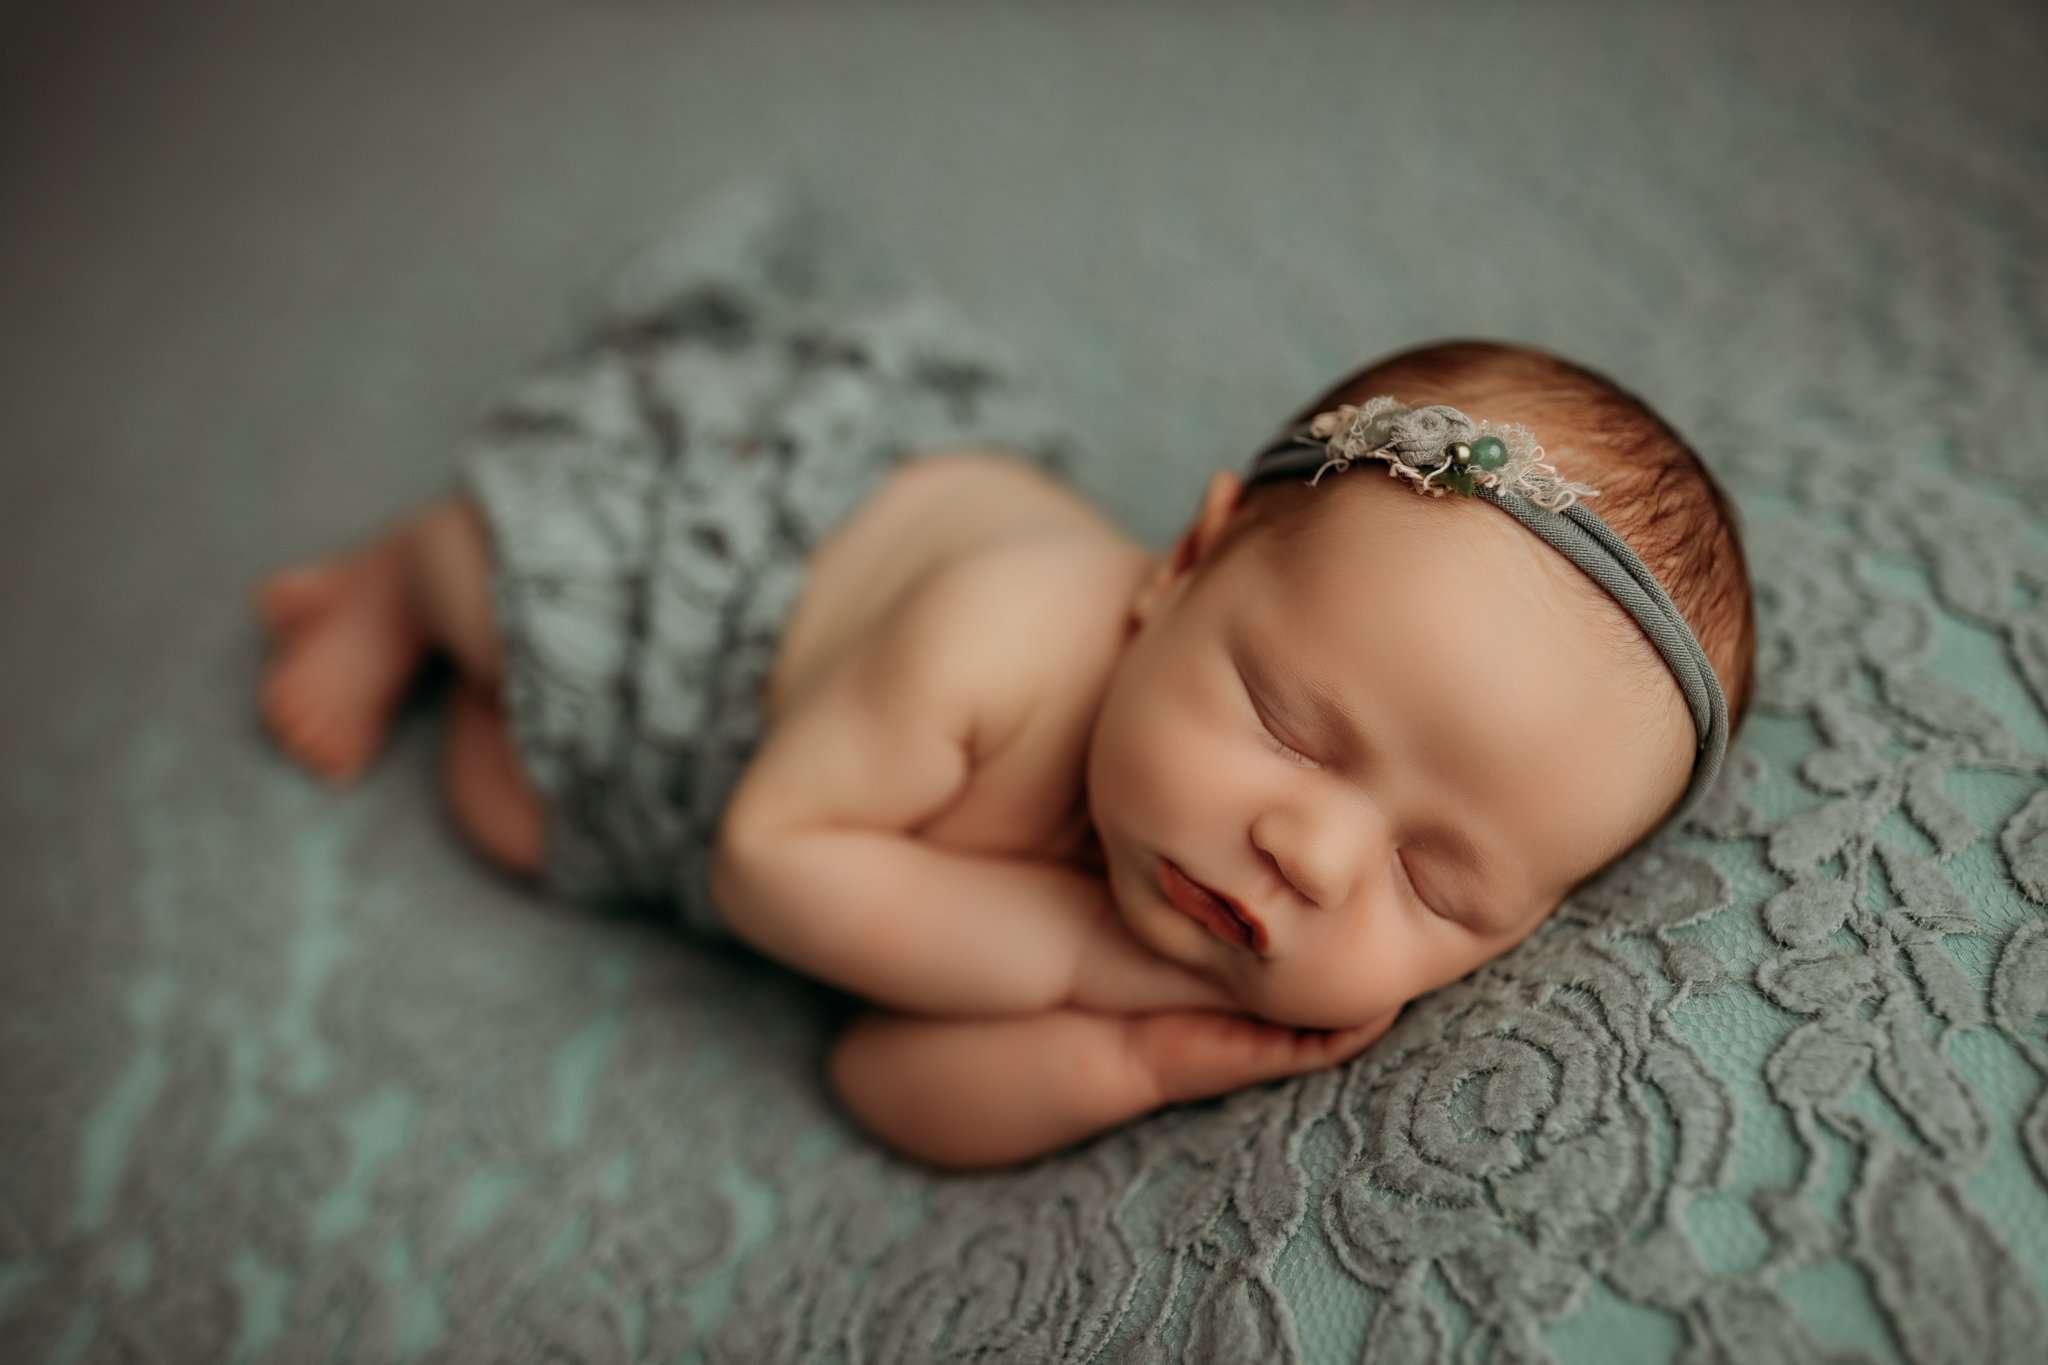 nwa newborn sleeping in side laying pose while facing camera sleeping